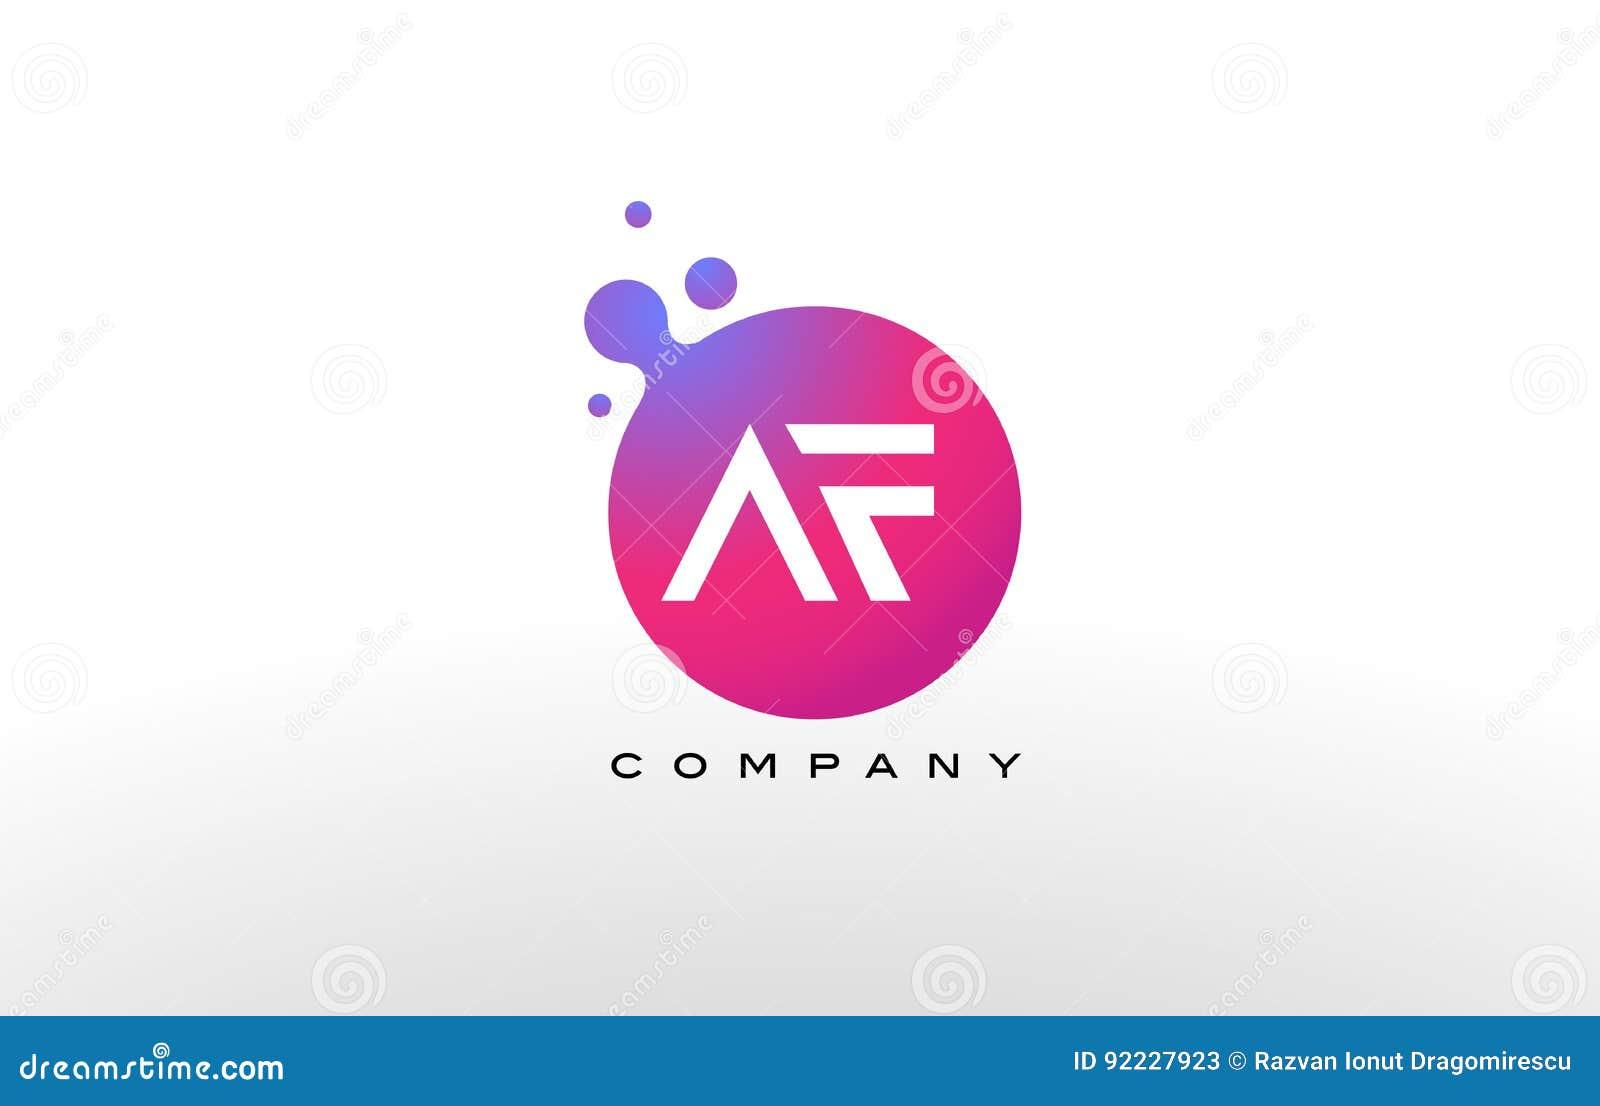 Af Letter Dots Logo Design With Creative Trendy Bubbles